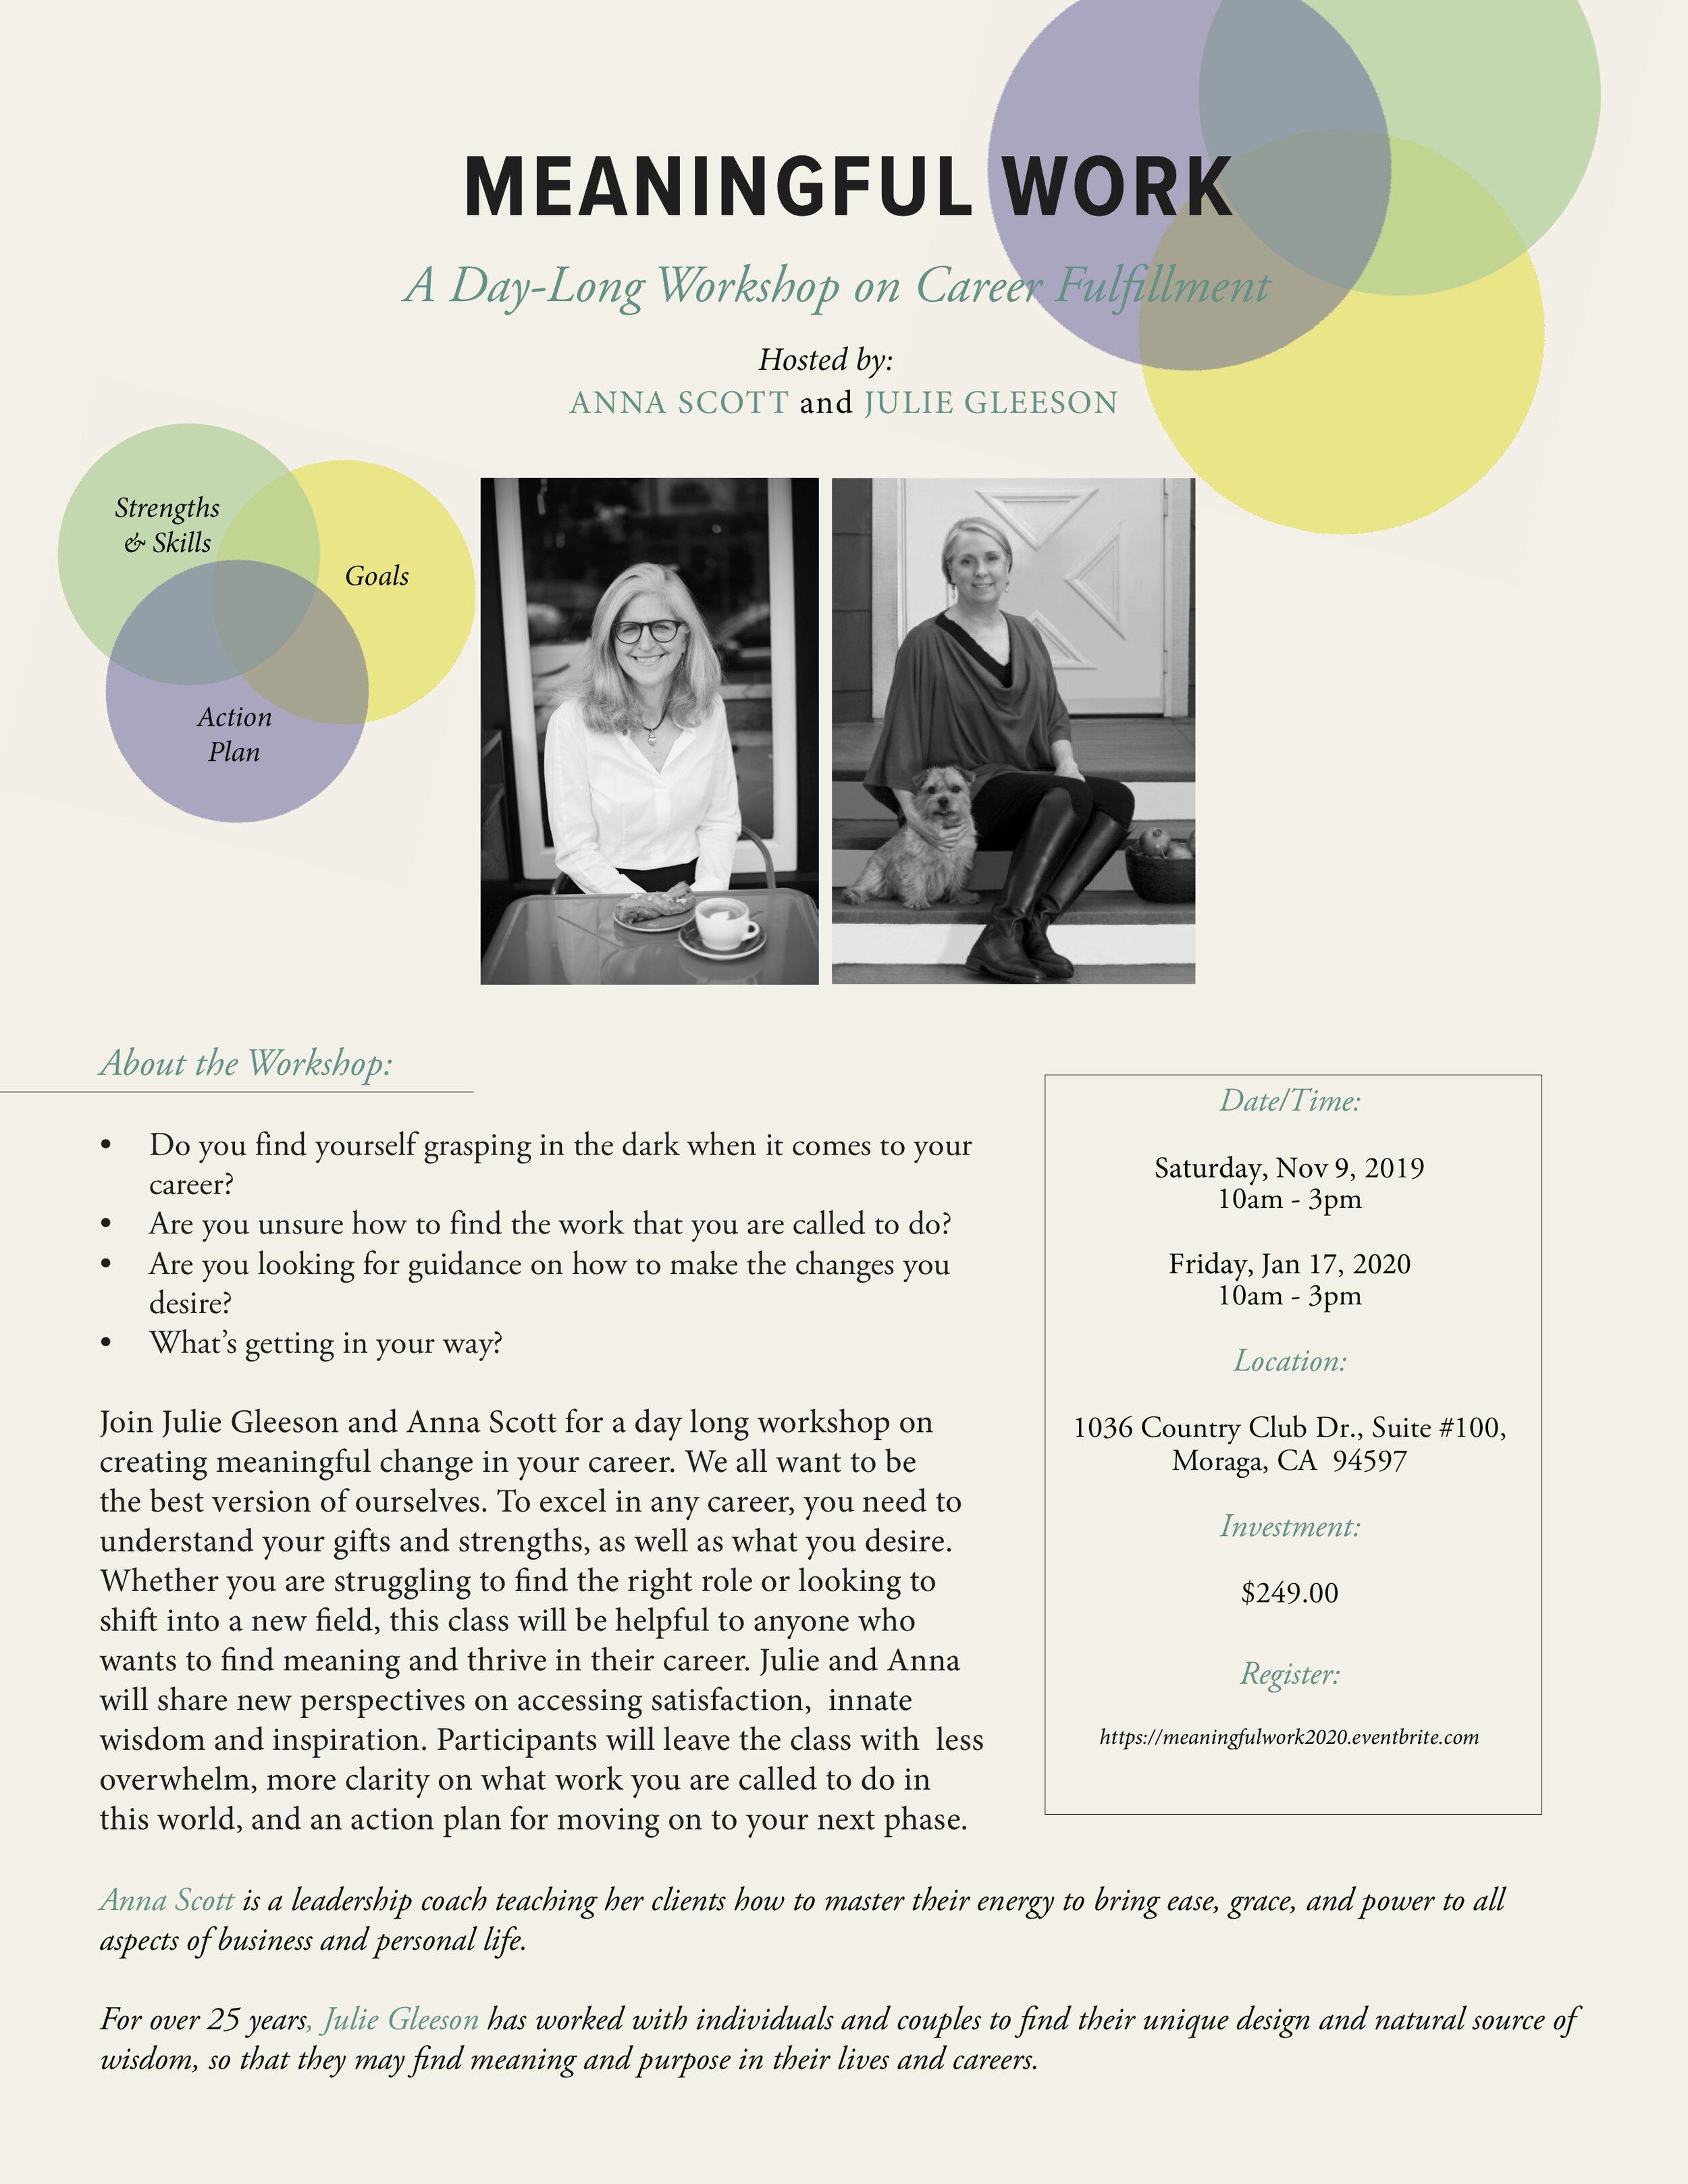 MeaningfulWork_Flyer Nov and Jan.jpg